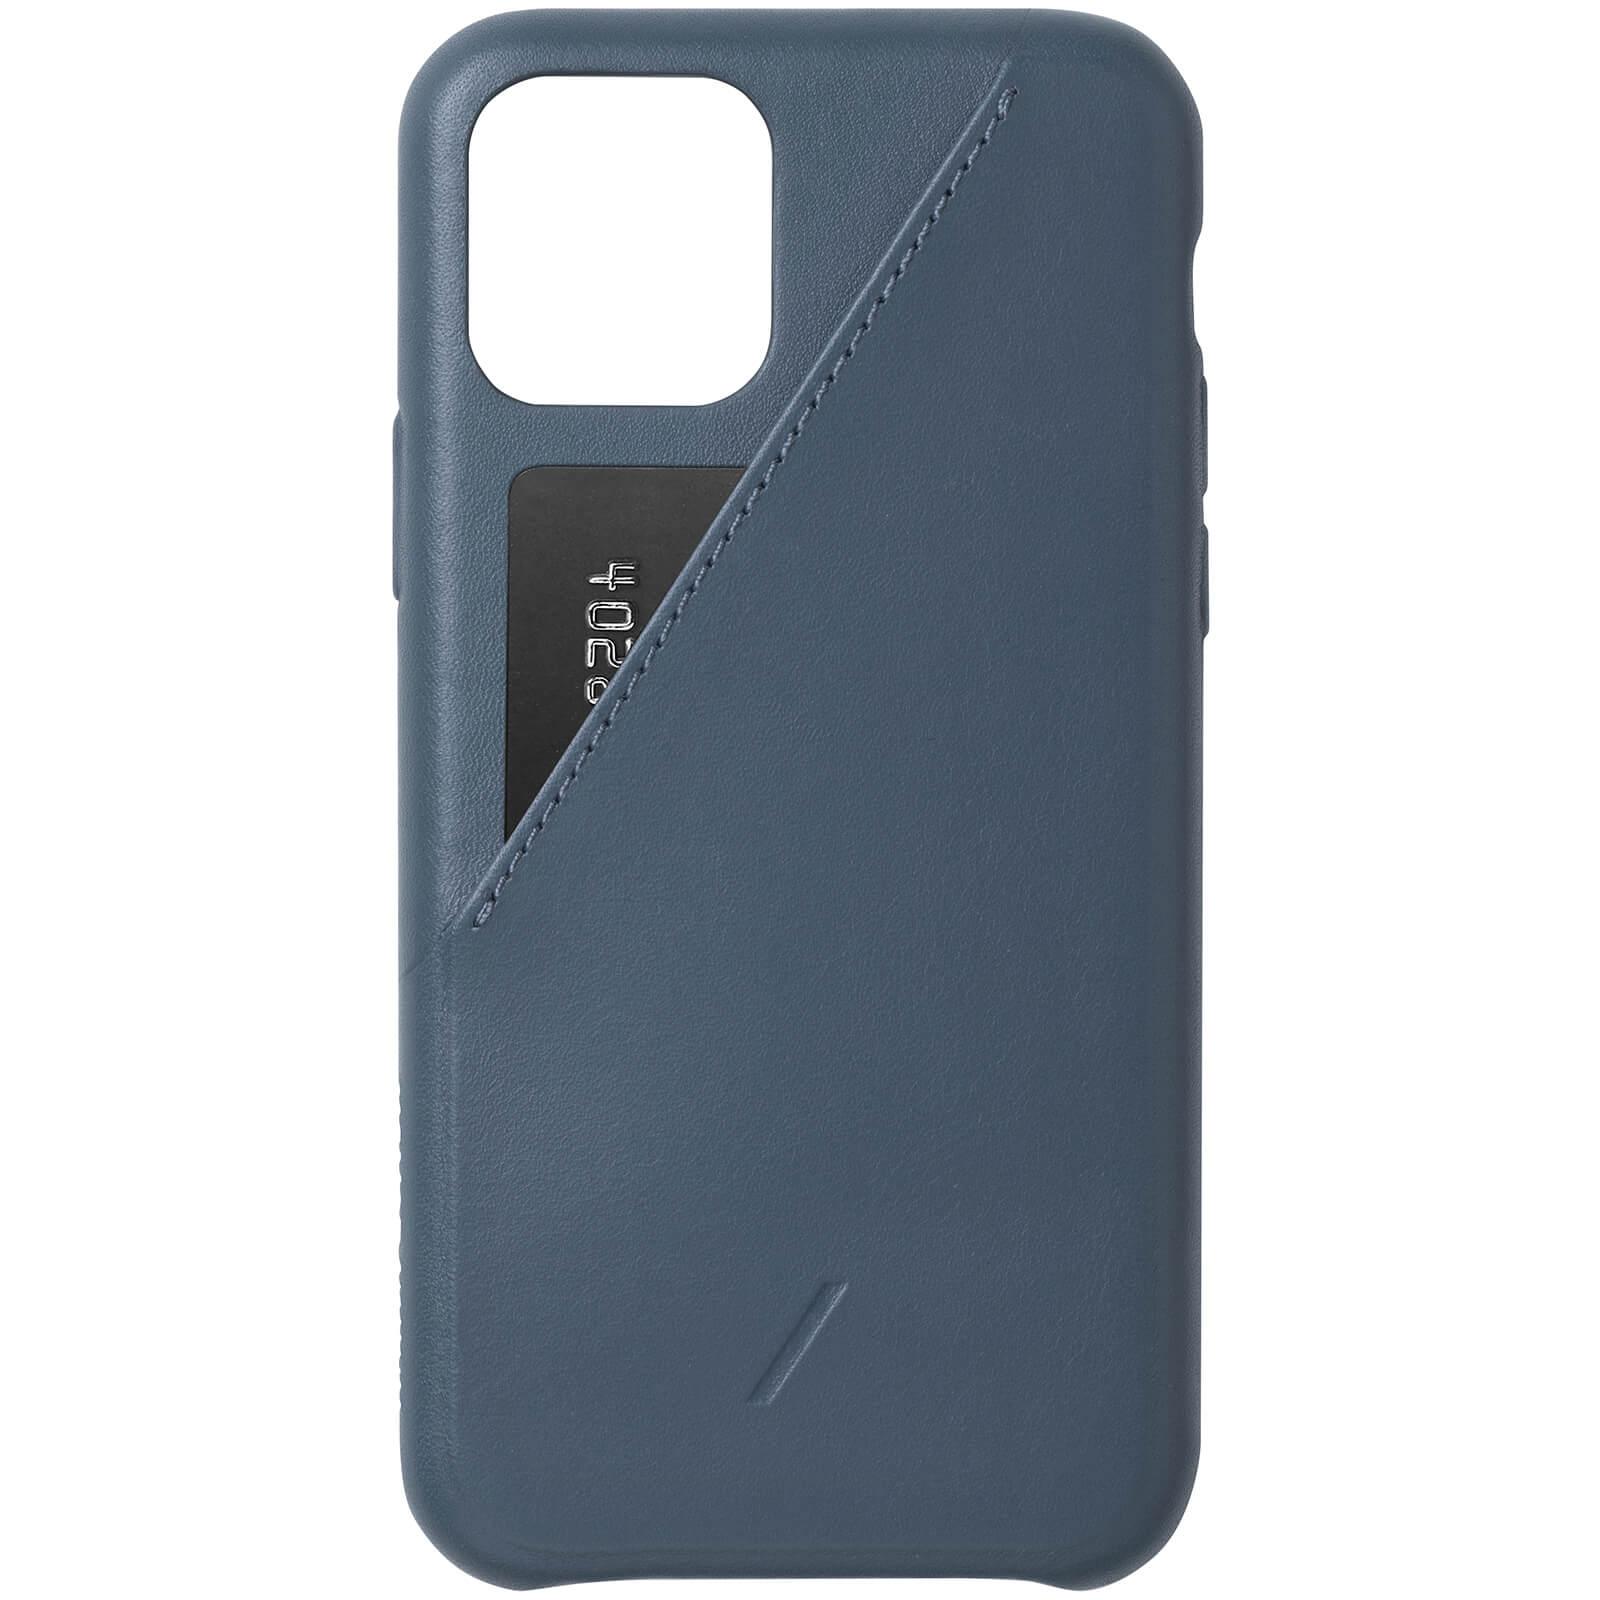 Native Union Clic Card iPhone Case - Navy - iPhone 11 Pro